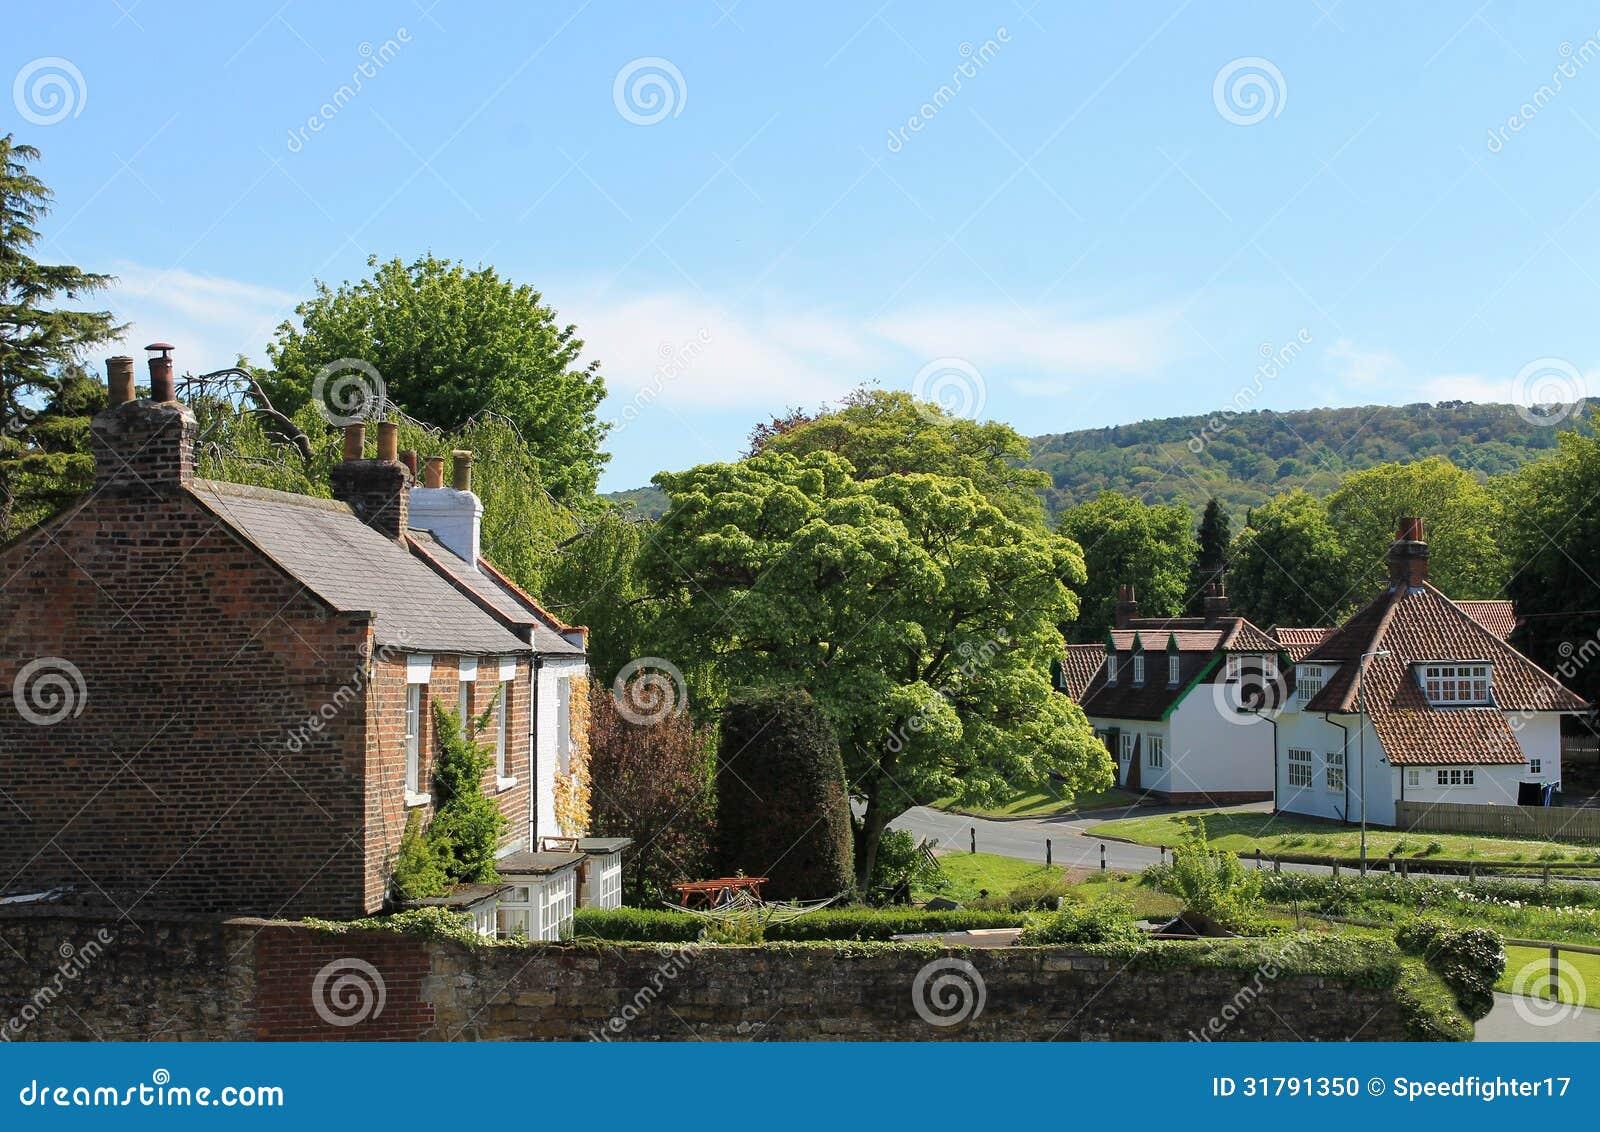 Quaint English Village Stock Photo - Image: 31791350 Quaint English Cottages